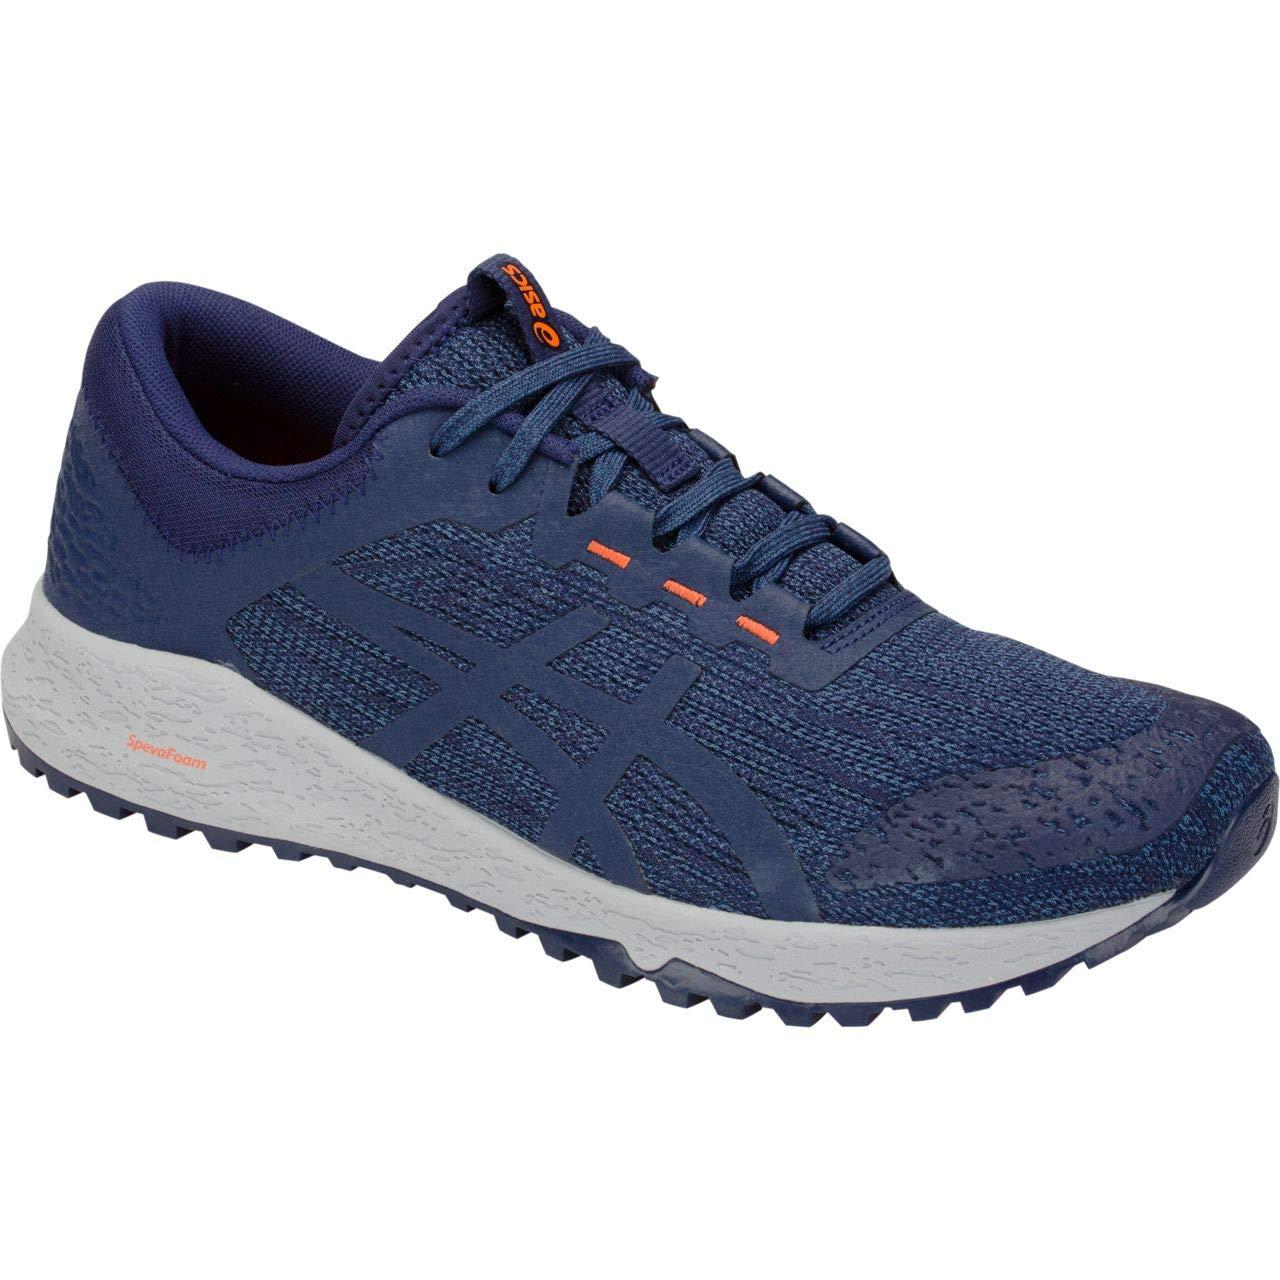 Xt Bags ukamp; Ss19Amazon co Asics Shoes Trail Running Alpine SpVqUMz